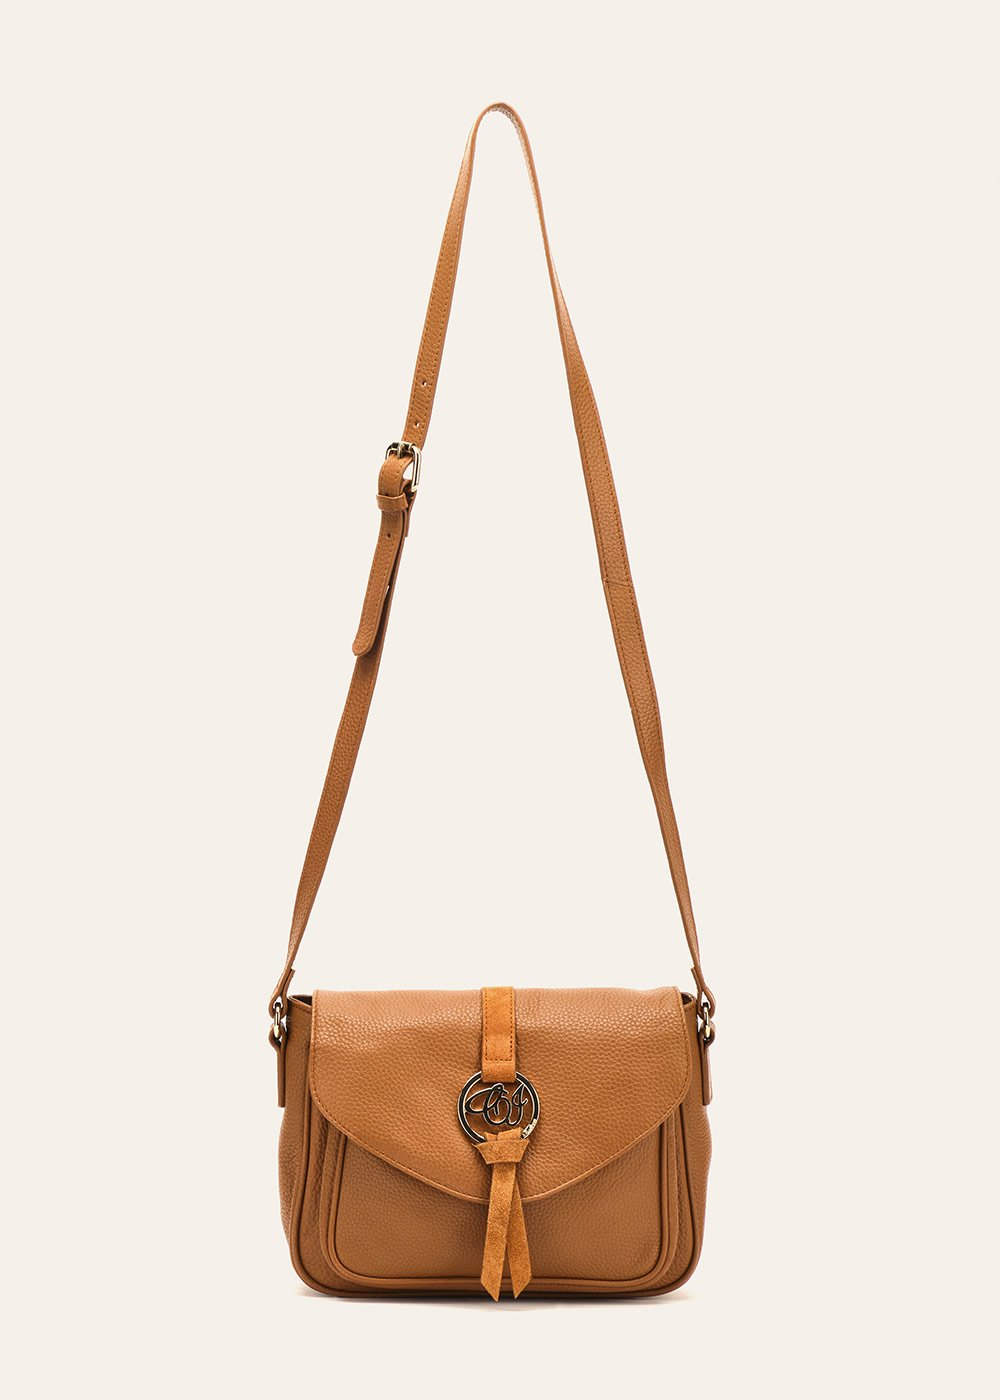 Belinda shoulder bag with flap fastening - Pecan - Woman